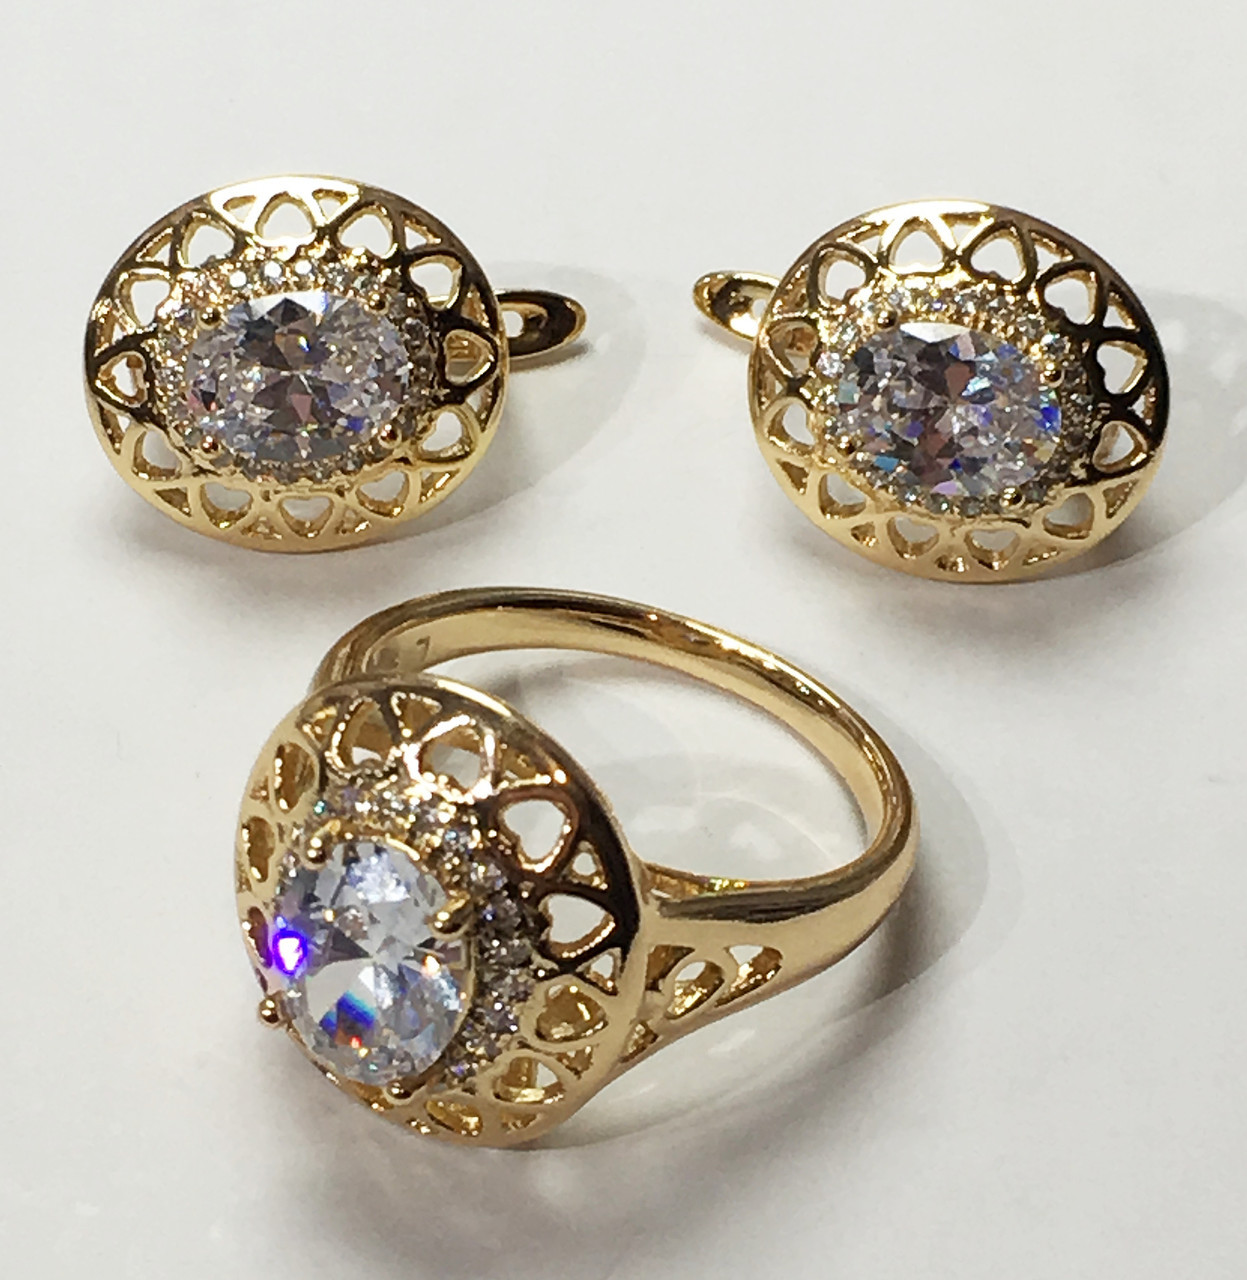 Набор Xuping серьги(D-15 H-13)+ кольцо, размер 17, 18, 19, 20